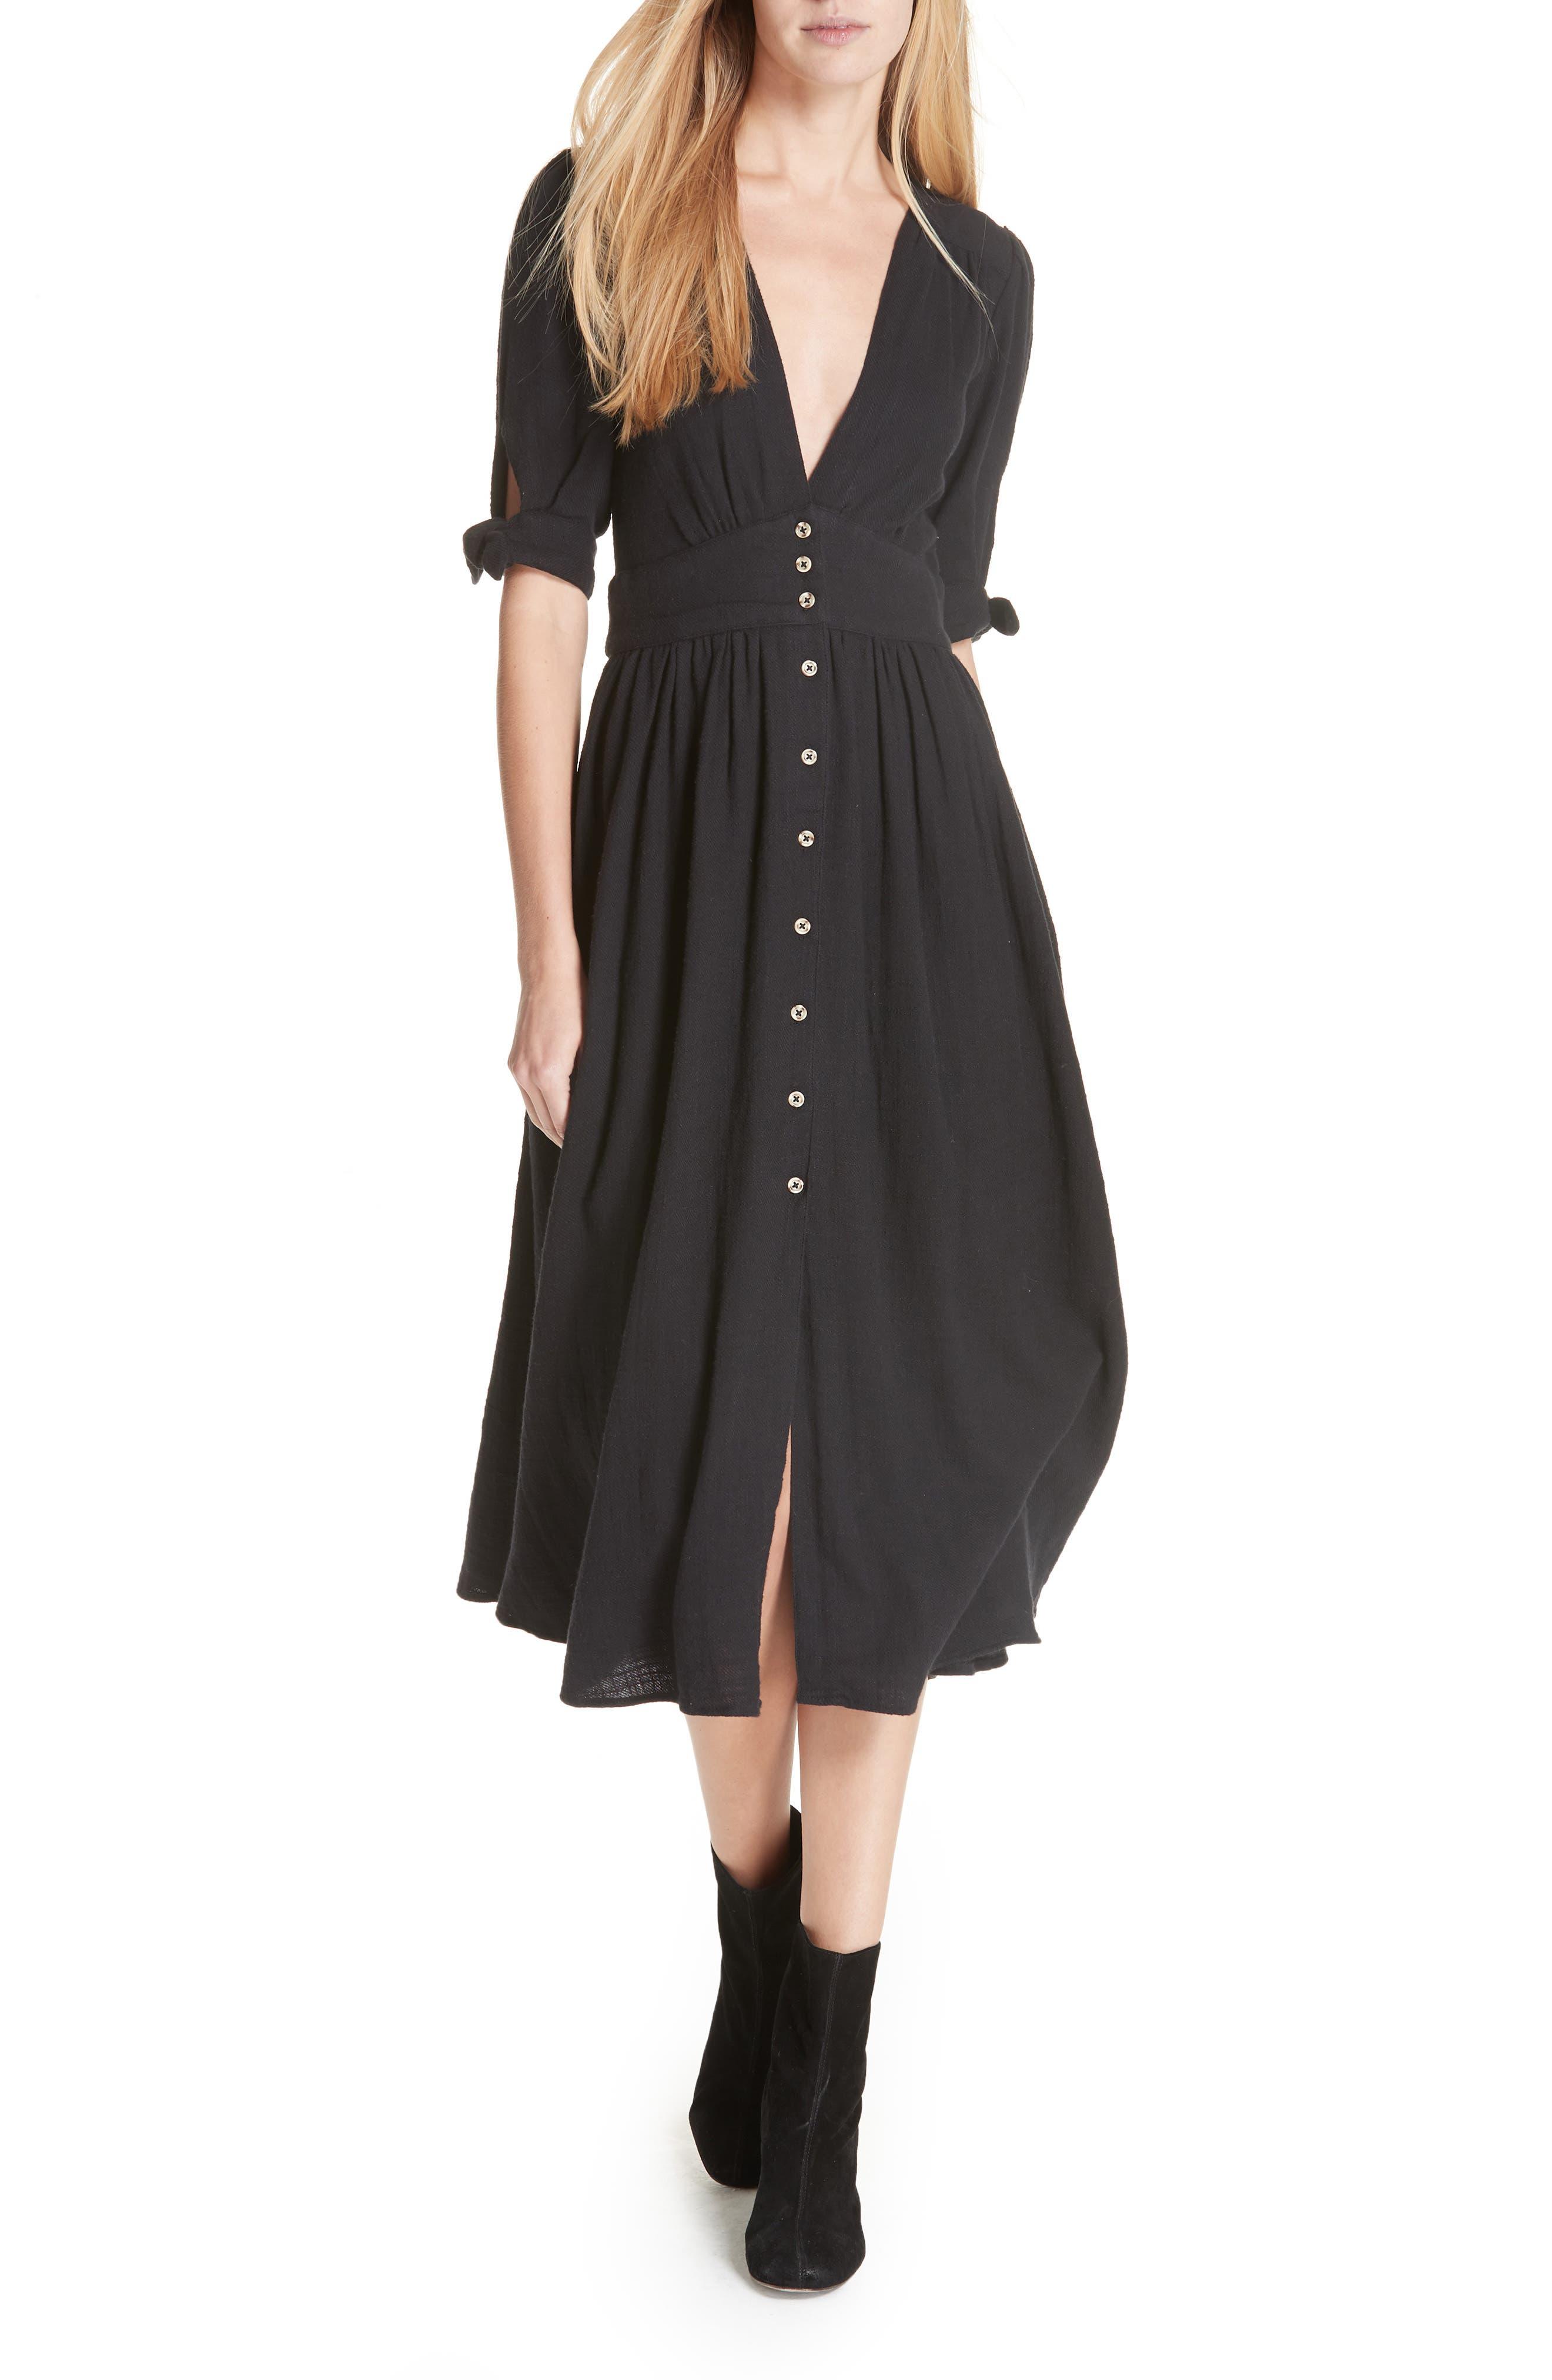 Free People Love Of My Life Midi Dress, Black